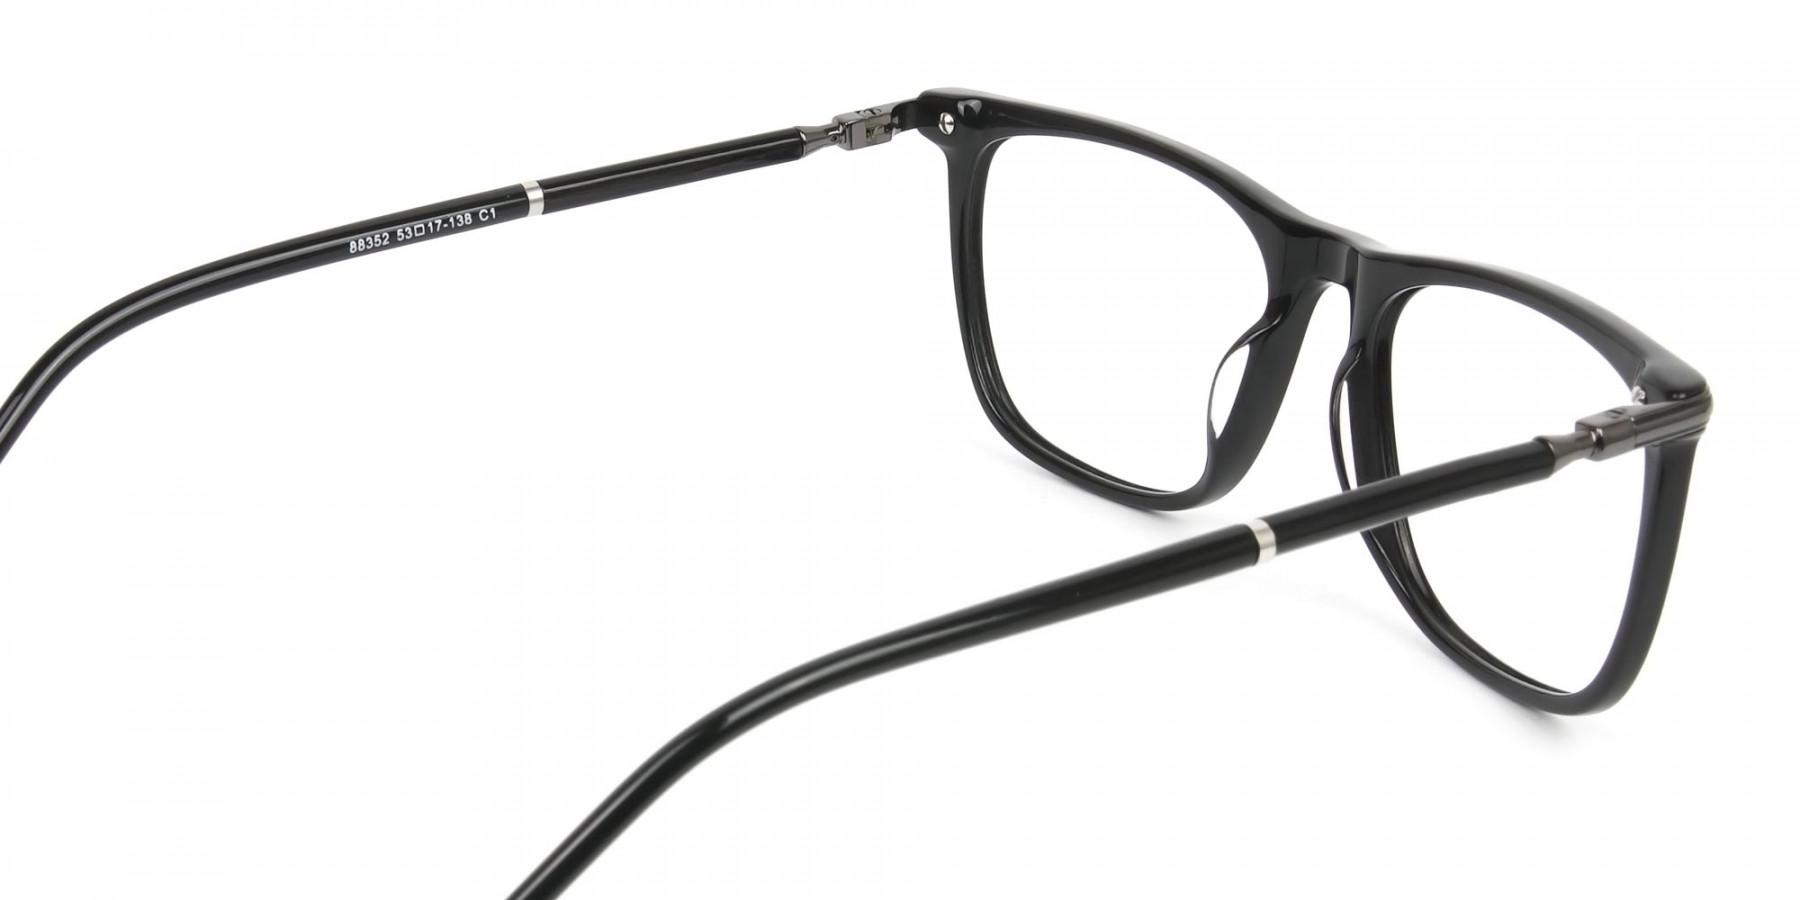 Geek Black Rectangular Spectacles in Acetate - 1